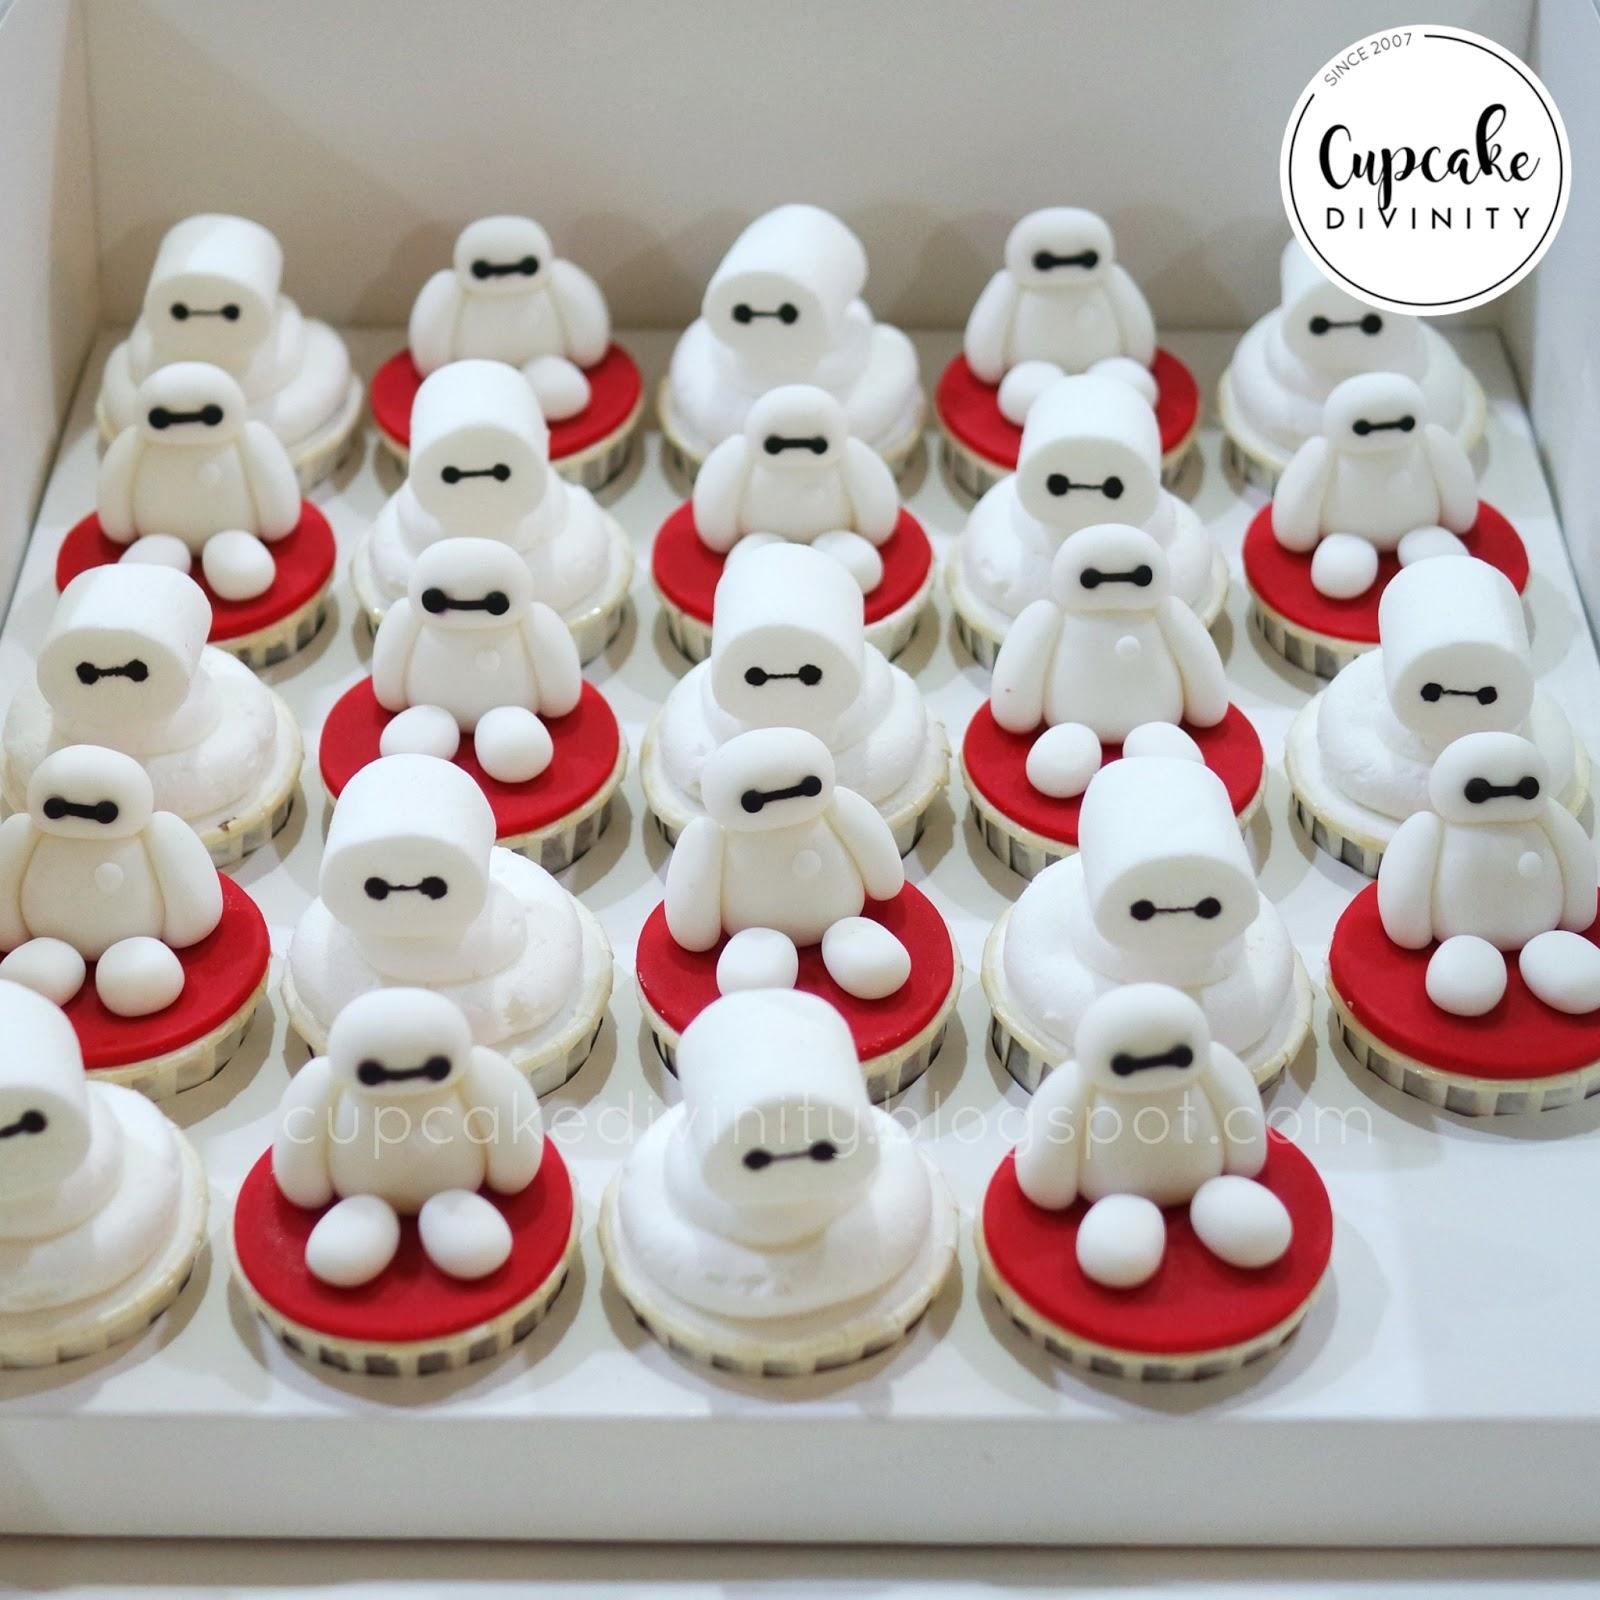 Edible DISNEY Big Hero 6 super heroes Baymax Birthday Icing Cupcake Cake Topper